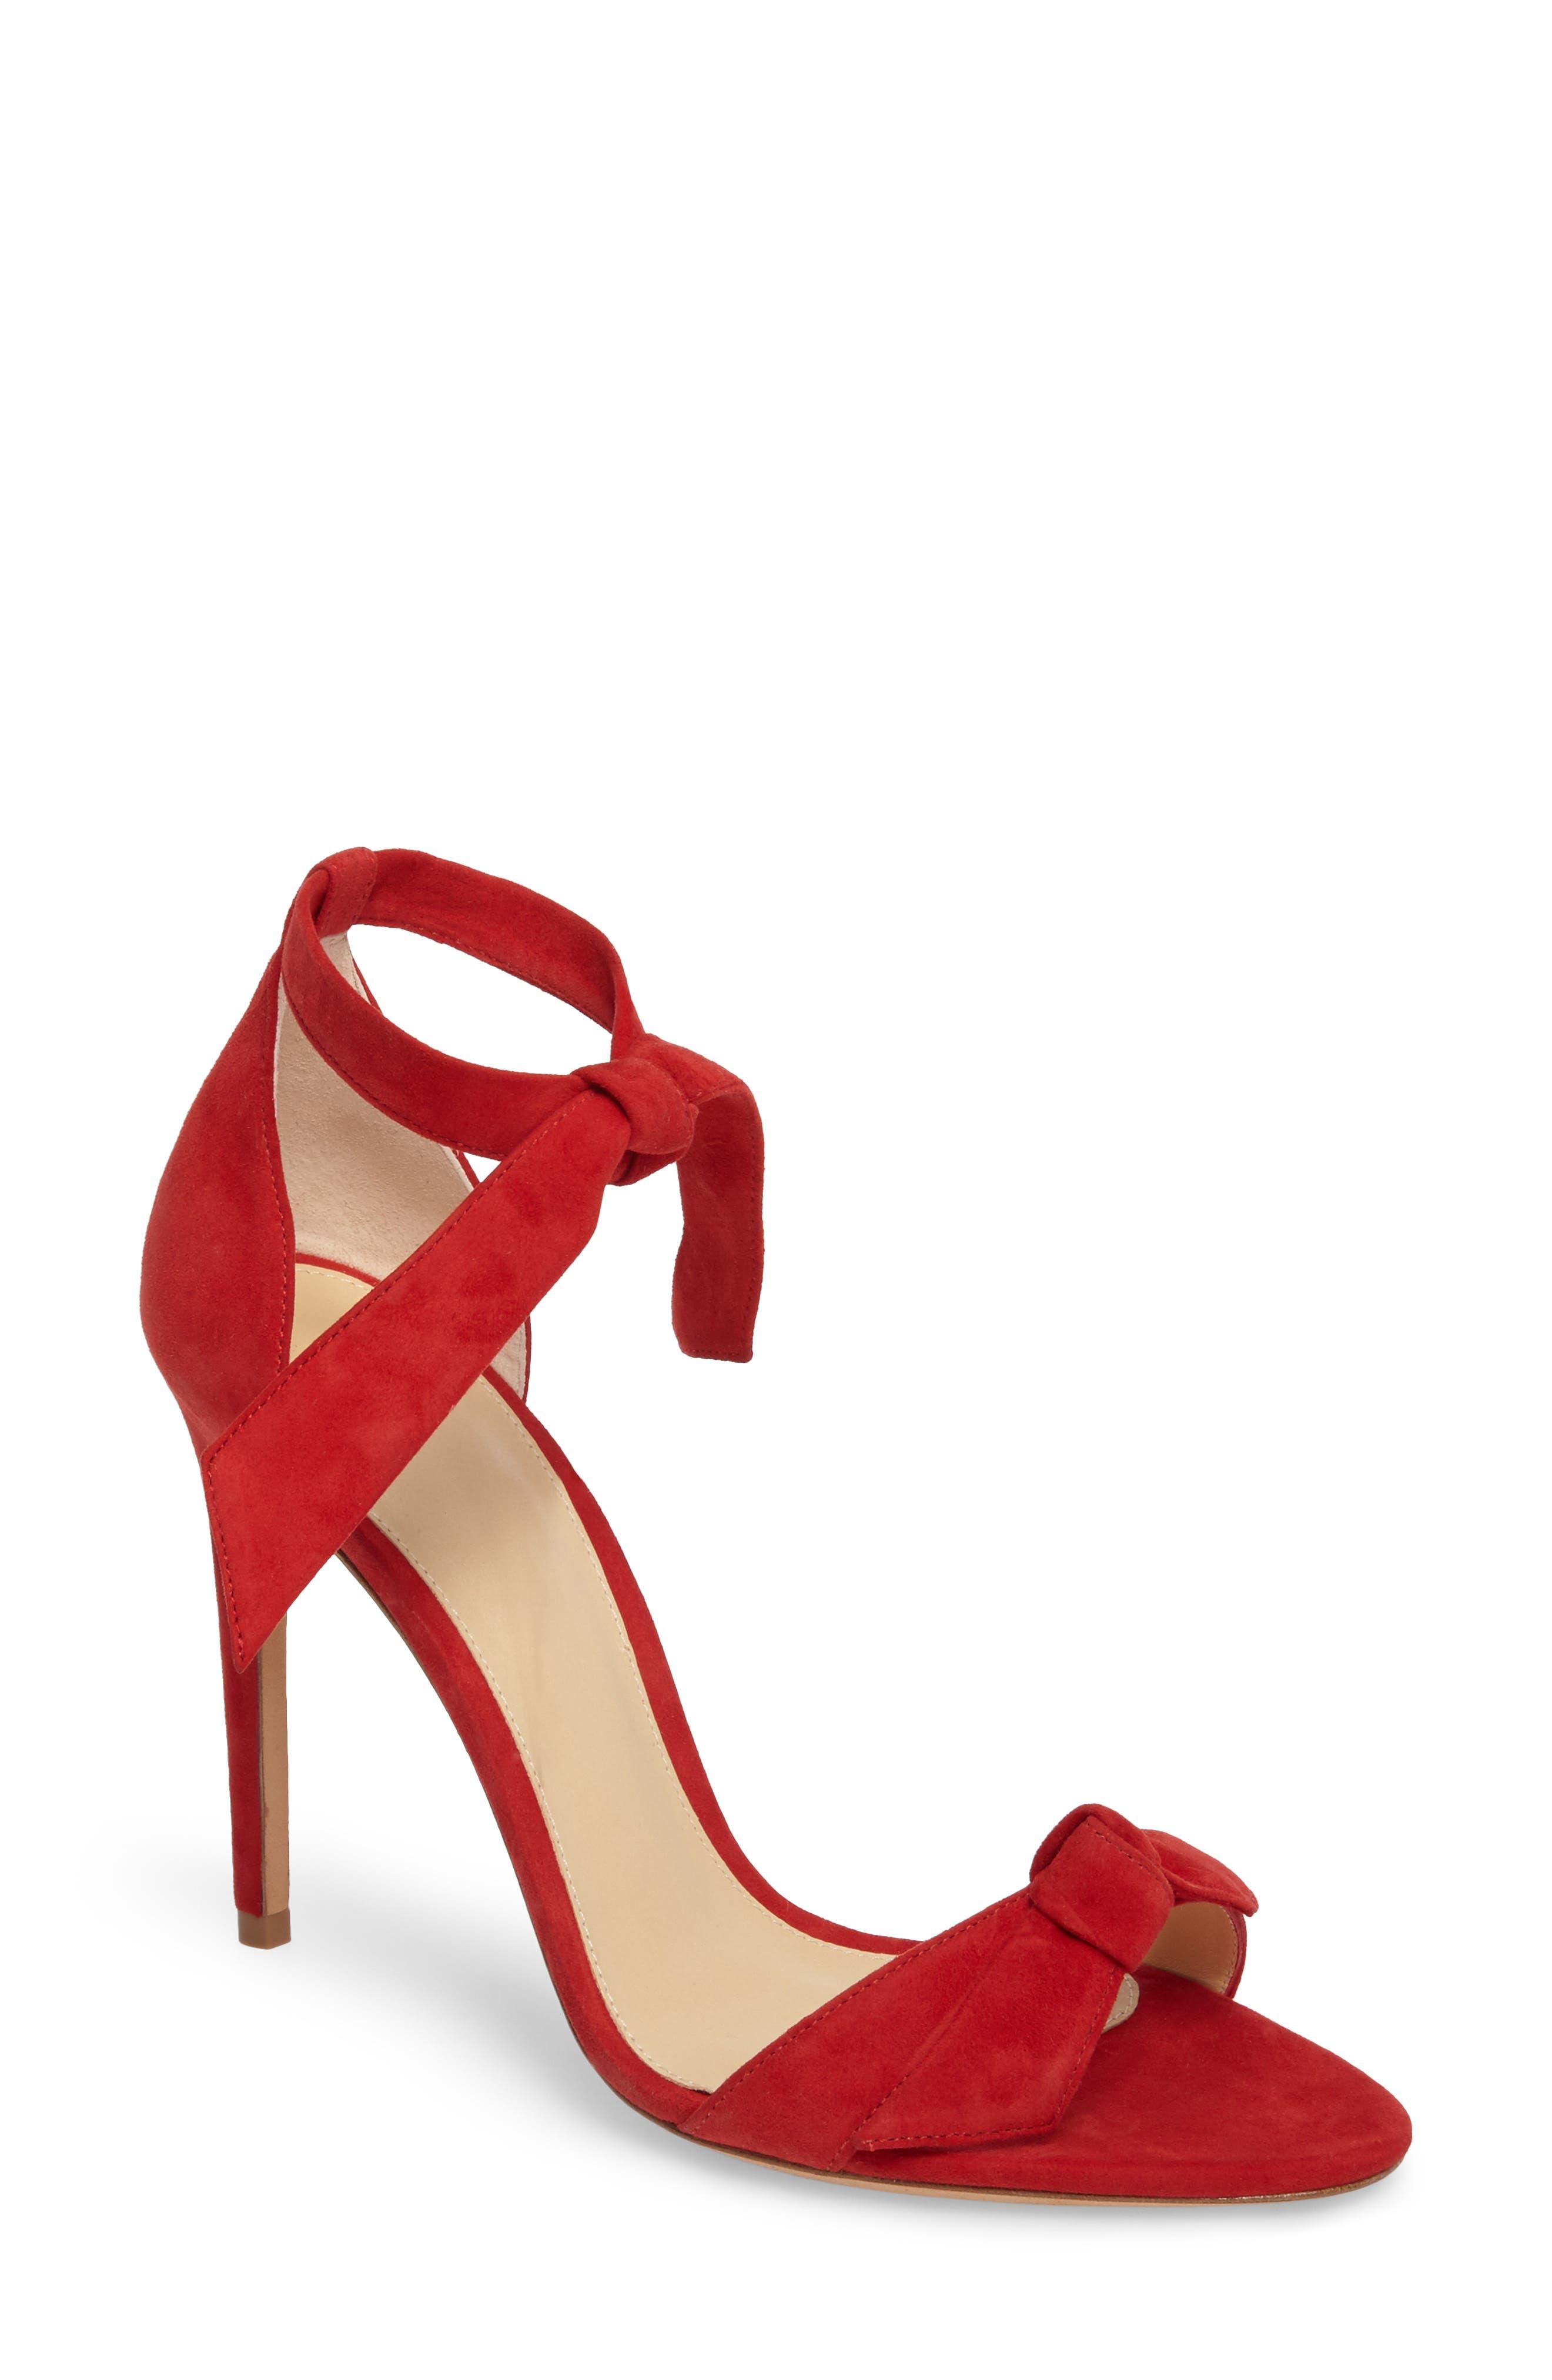 'Clarita' Ankle Tie Sandal,                             Main thumbnail 1, color,                             FLAME SUEDE